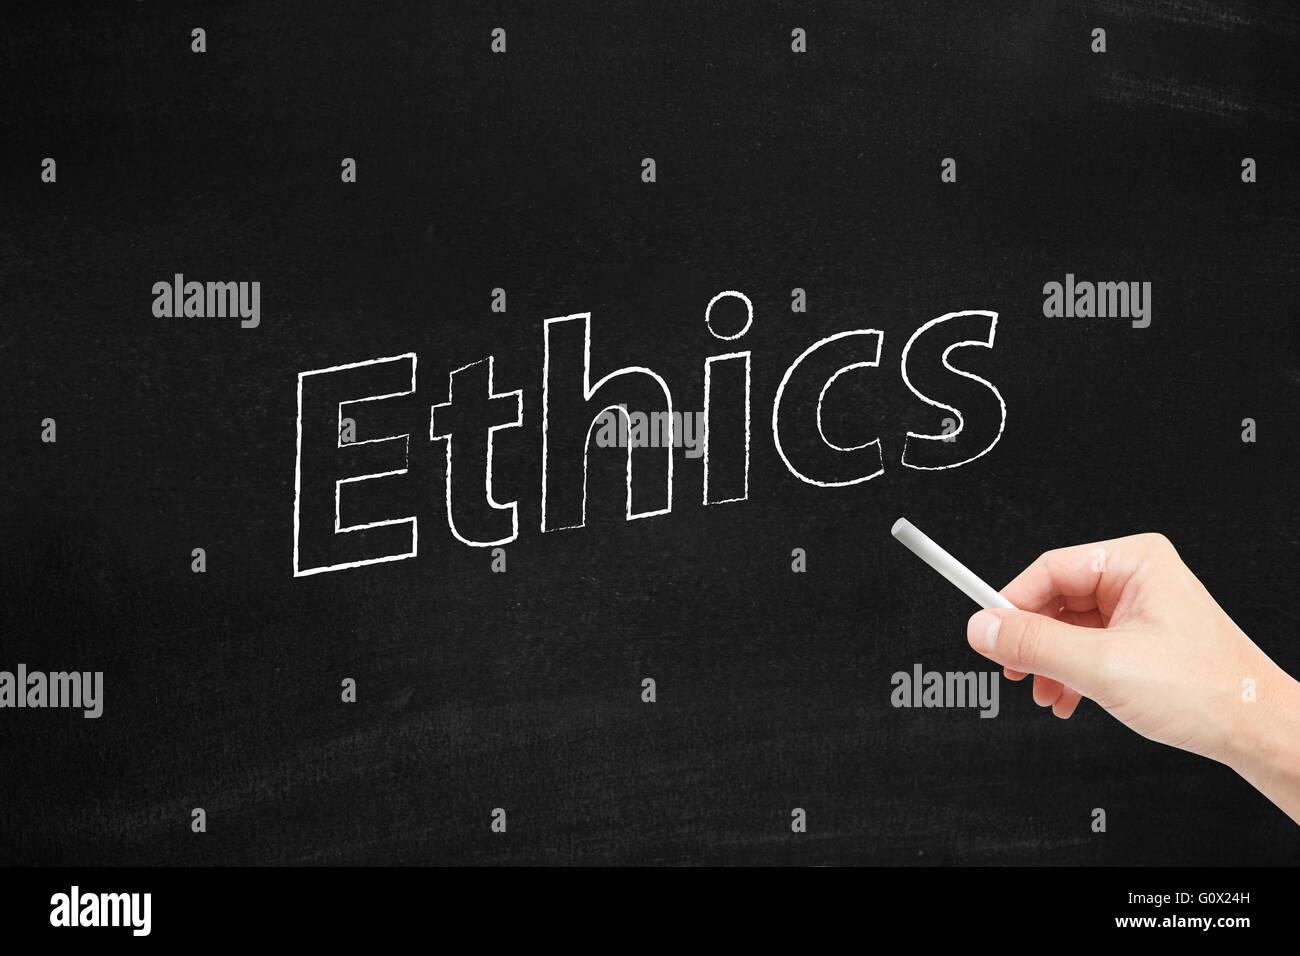 Ethics written on a blackboard Stock Photo